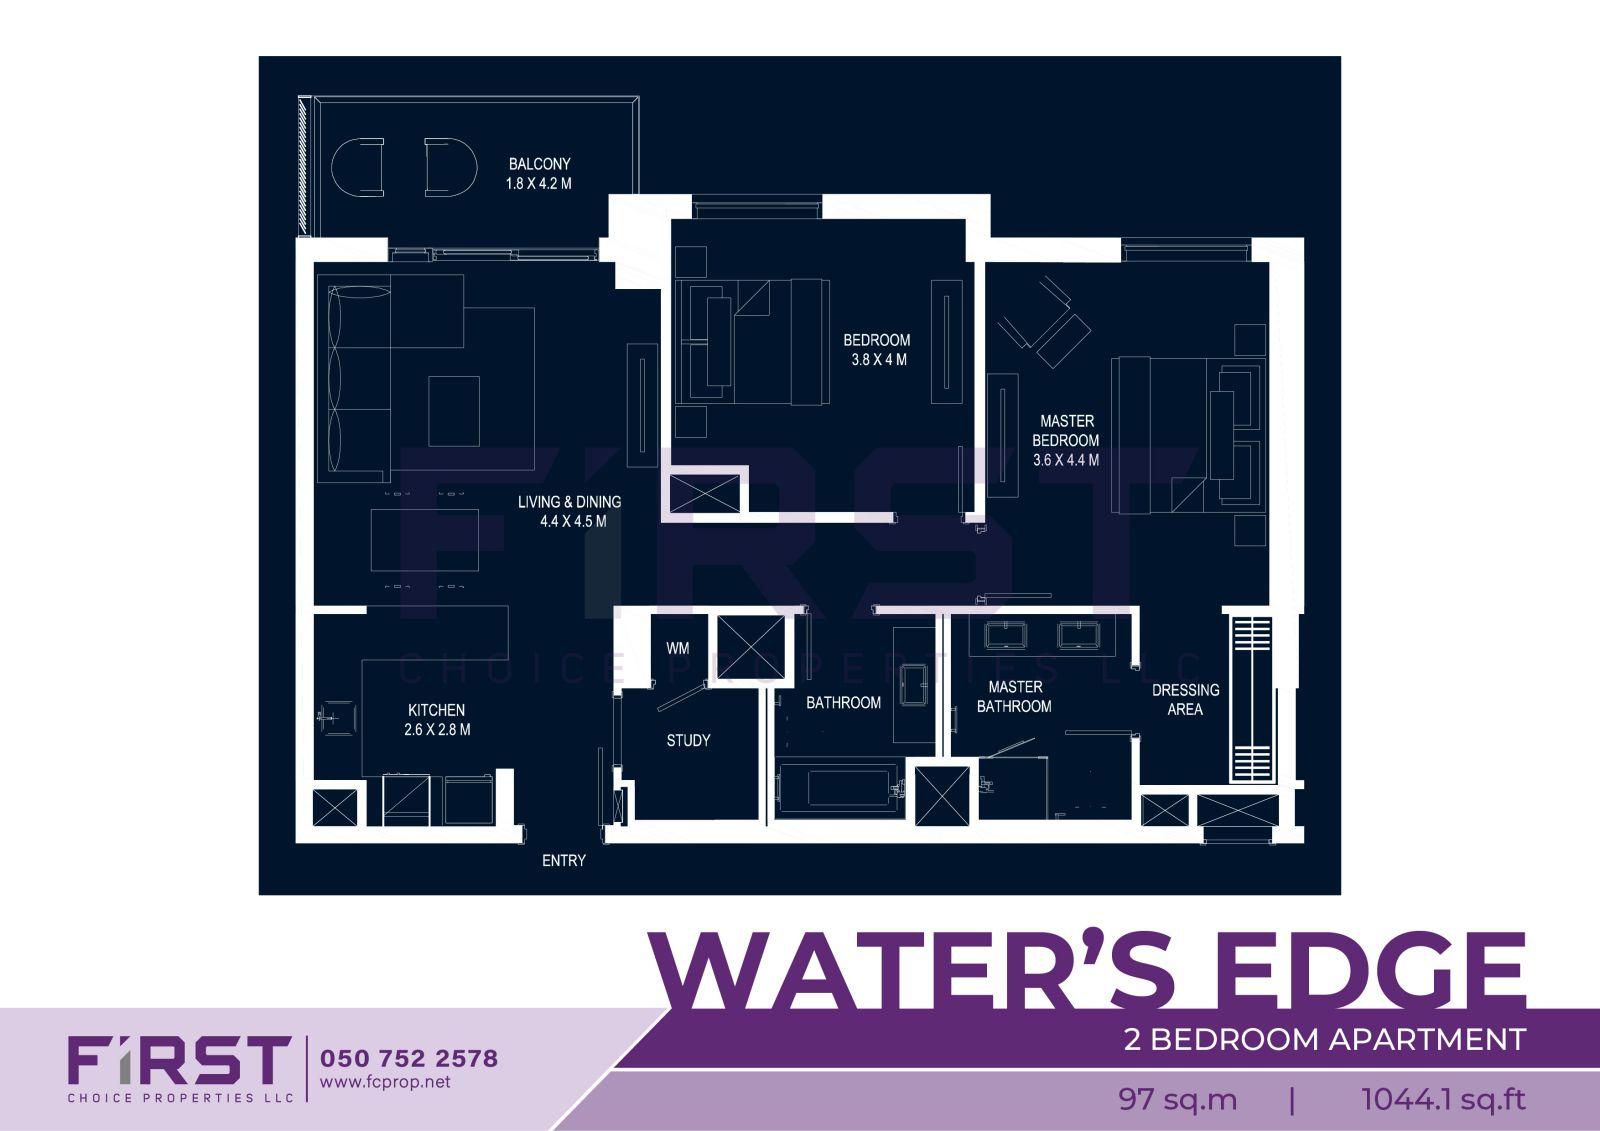 Yas Island Water's Edge 2 Bedroom 97 sq.m 1044.1 sq.ft .jpg